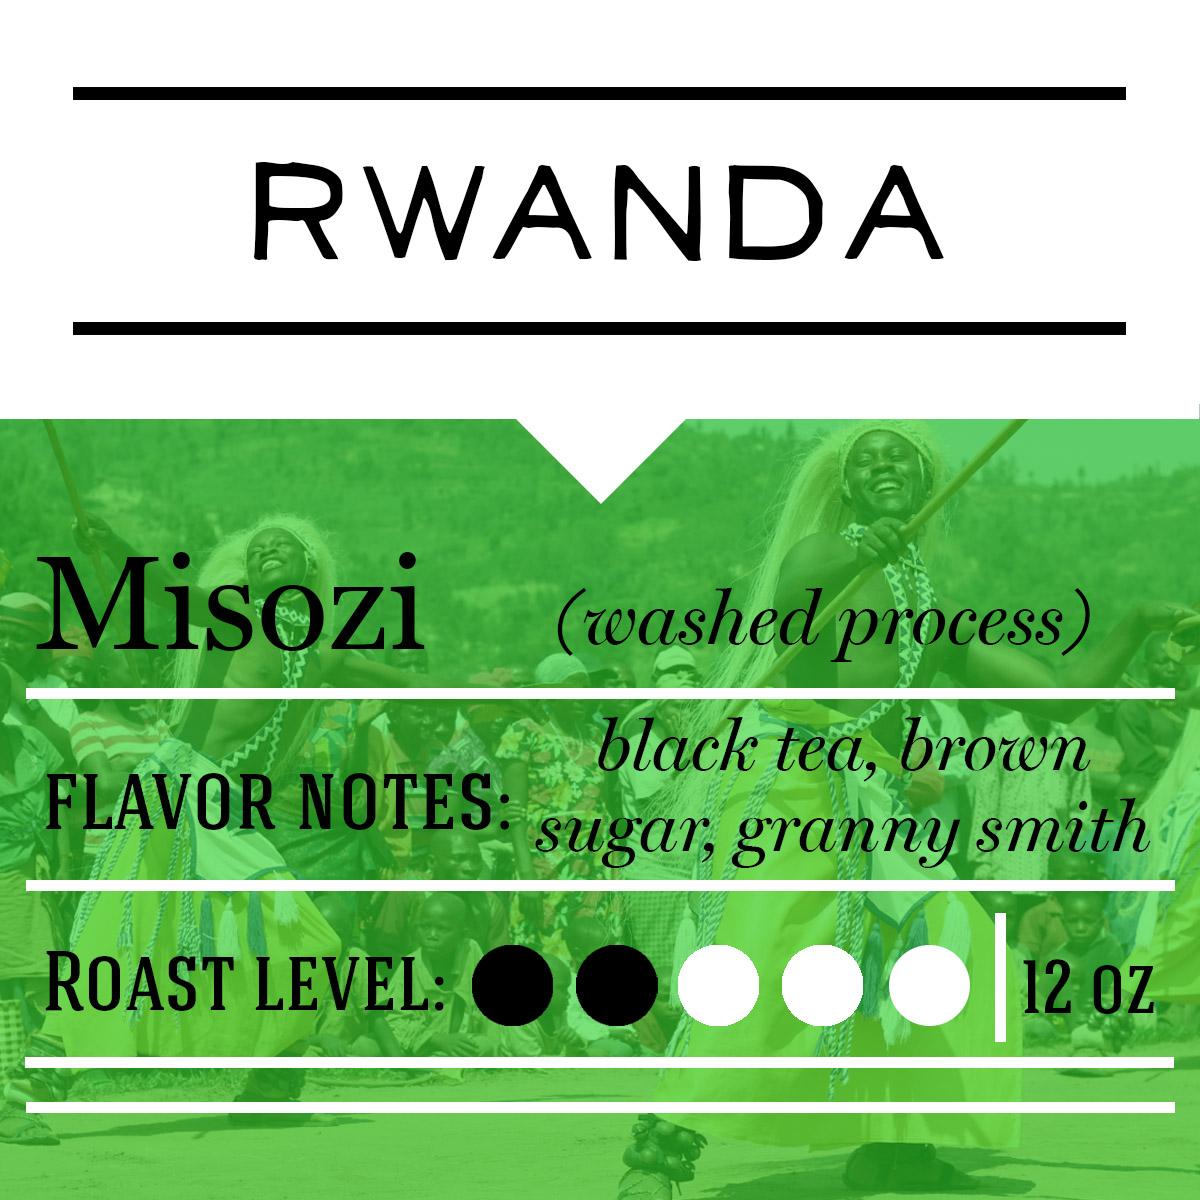 Rwanda Kopakaki - Patriot Coffee Roasters - Central Florida